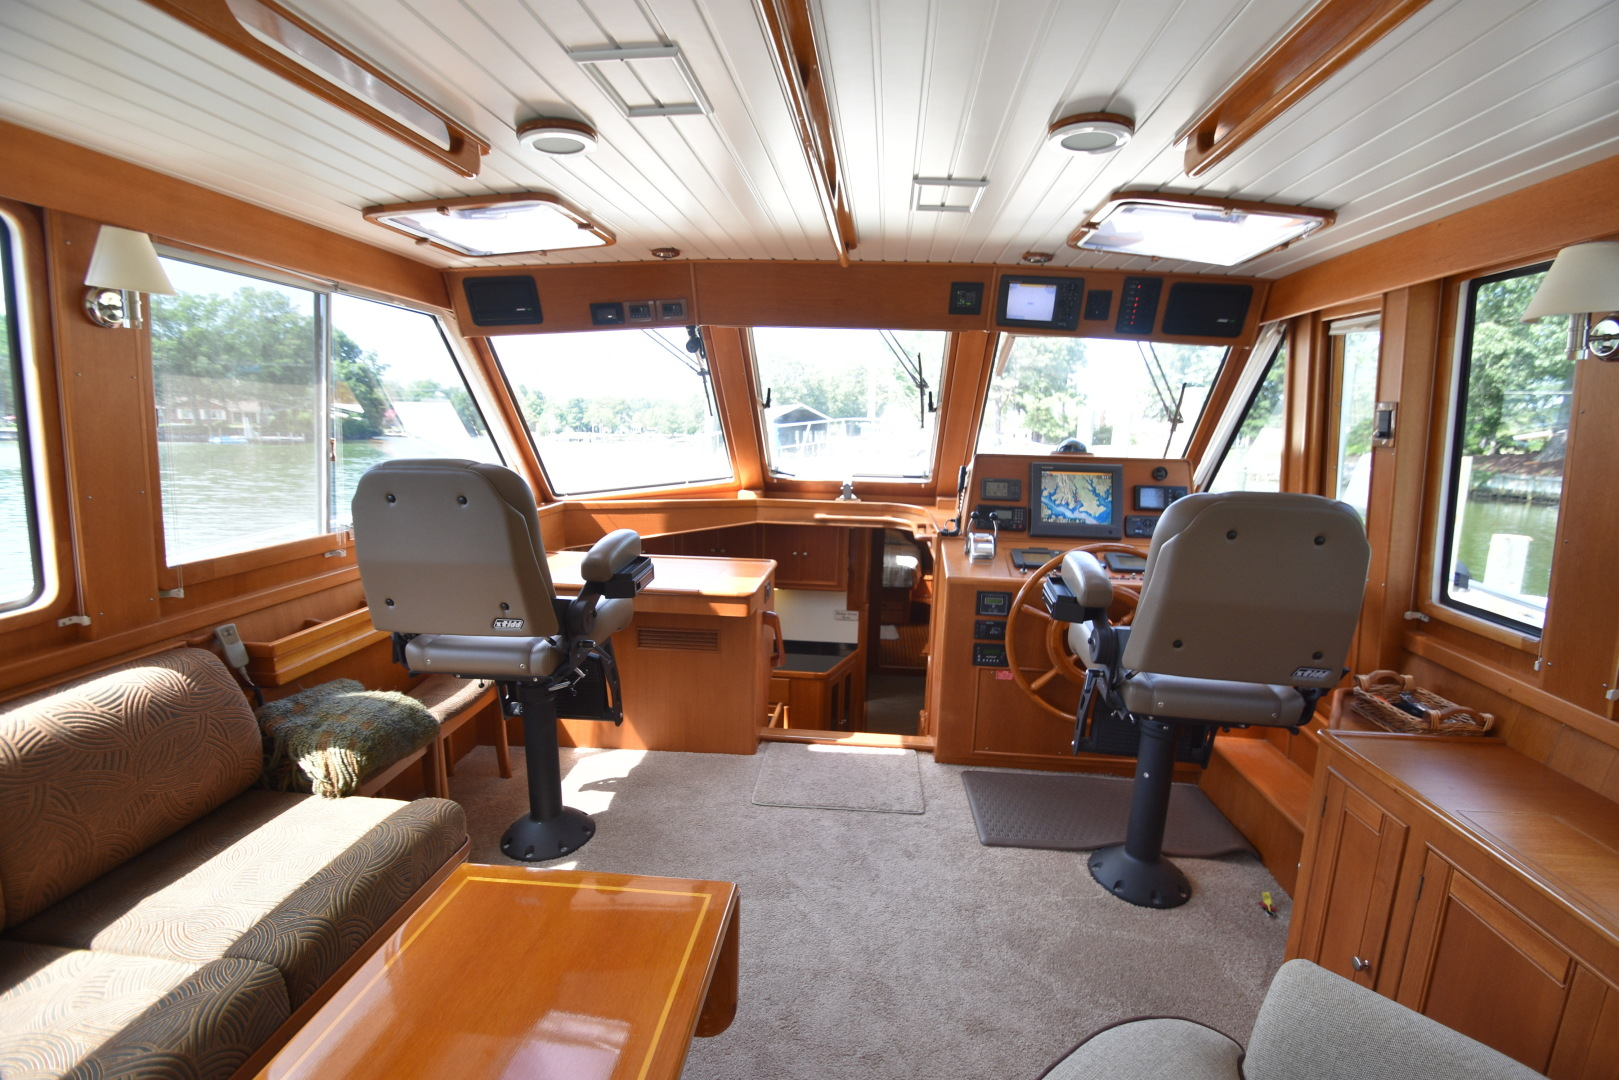 Grand Banks-49 Eastbay SX 2005-Arietta Annapolis-Maryland-United States-1456199   Thumbnail